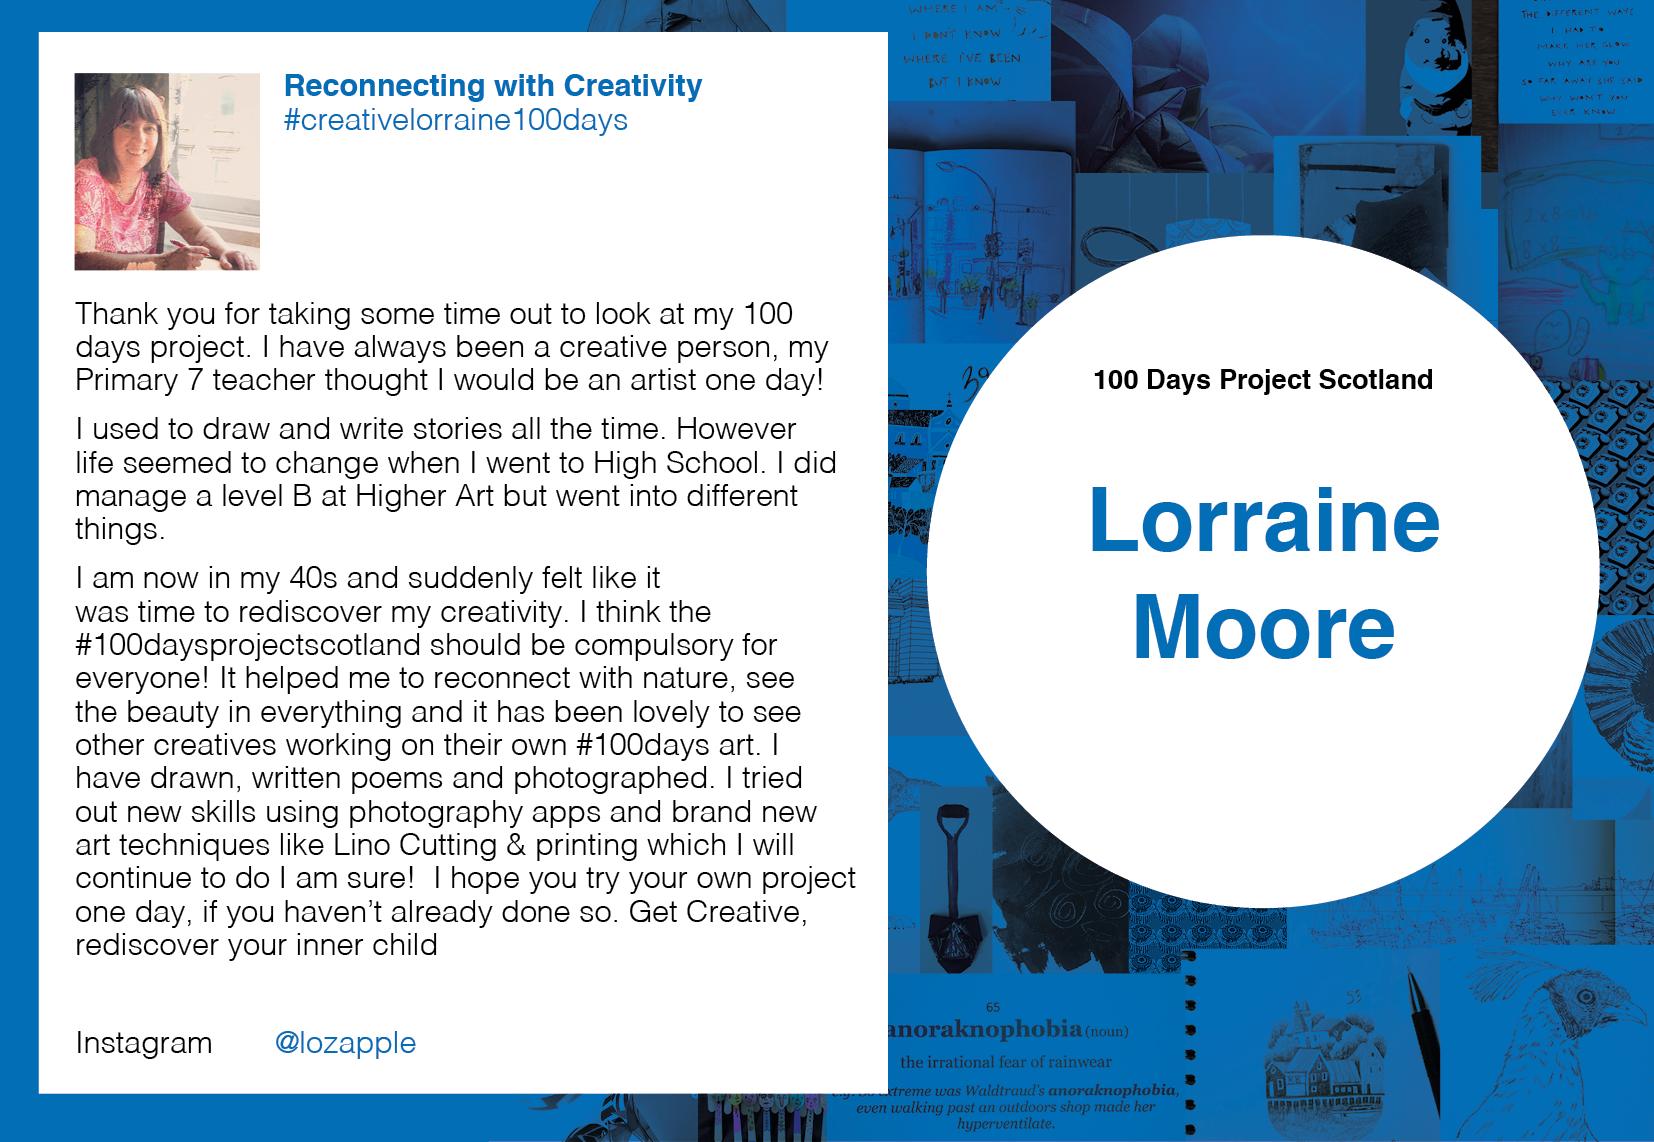 Lorraine Moore